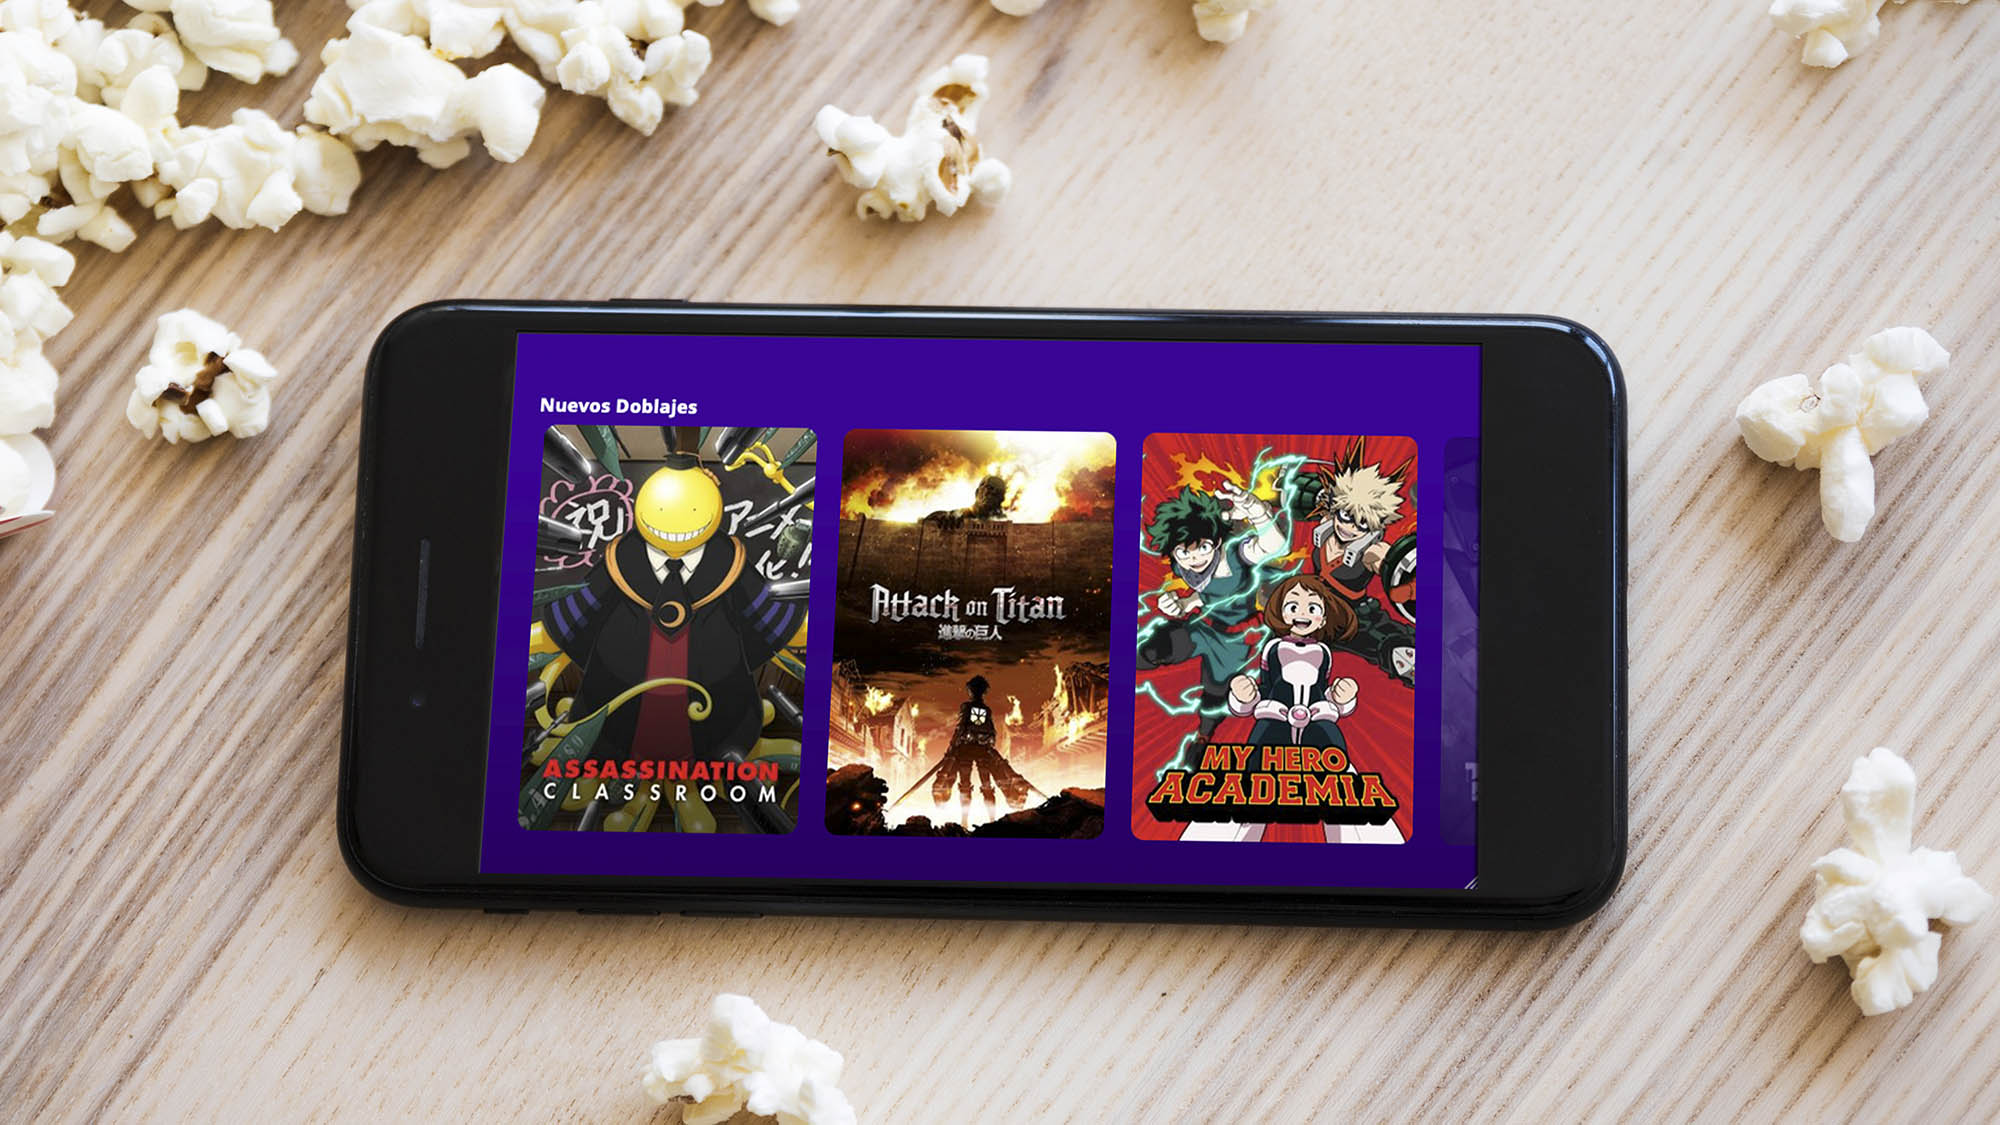 plataformas para ver Animes